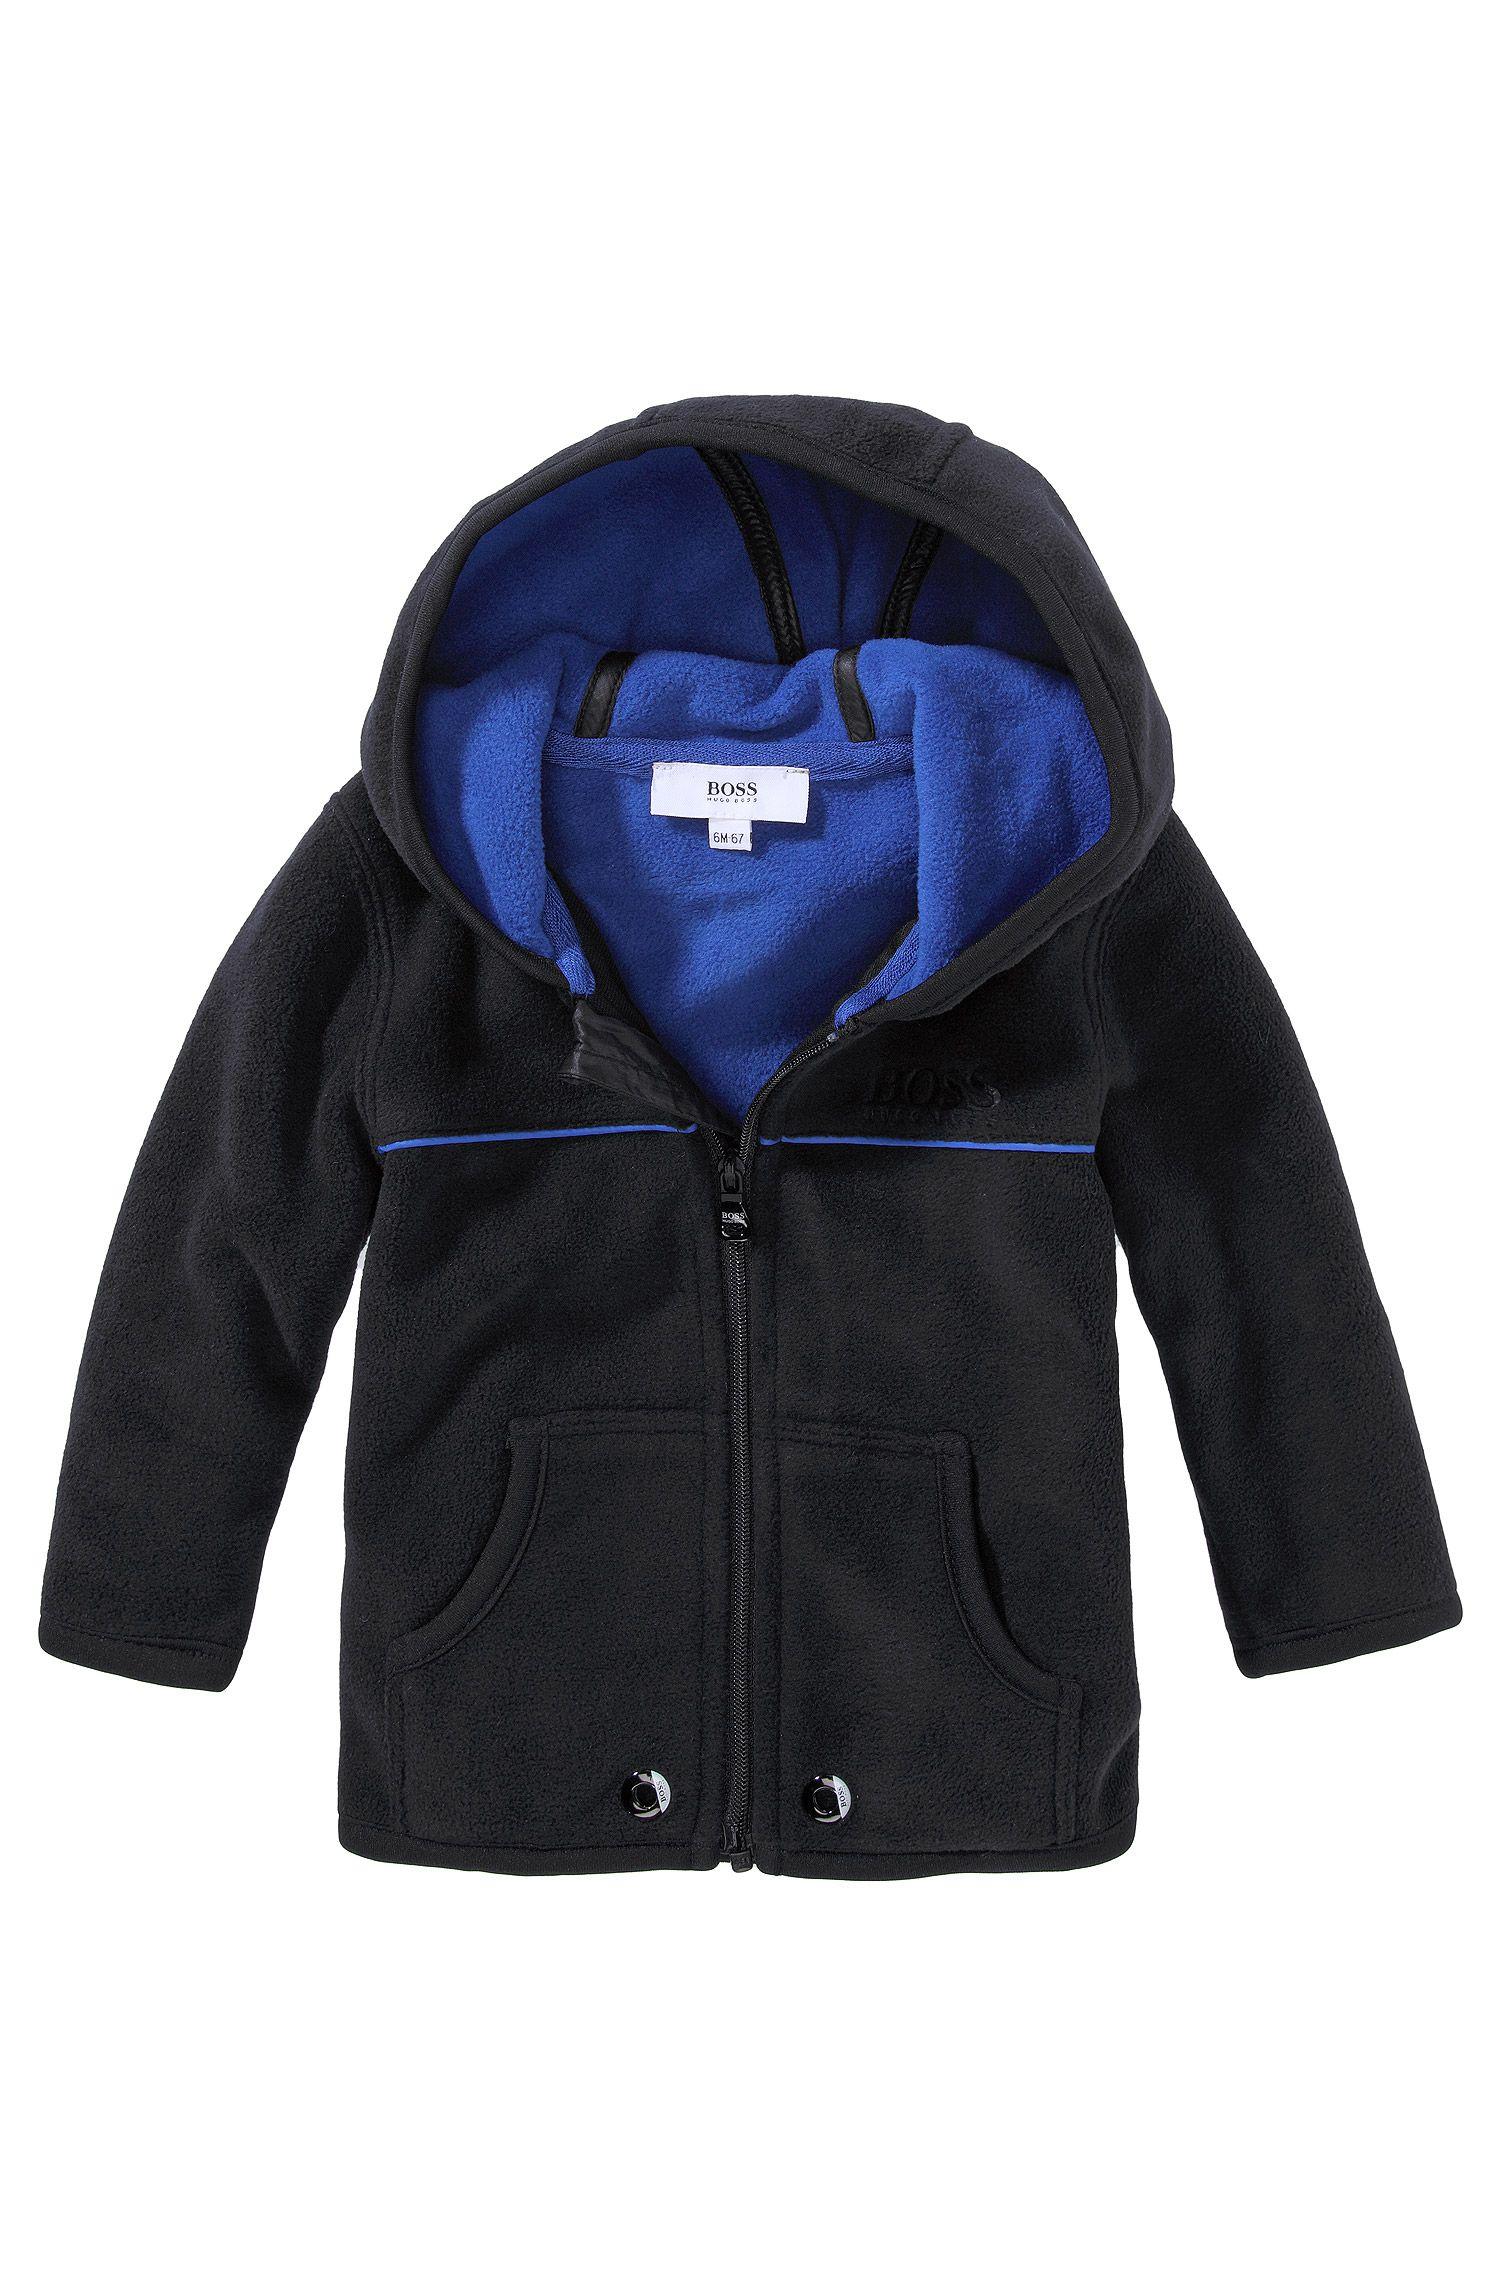 'J05253' | Toddler Fleece Jacket